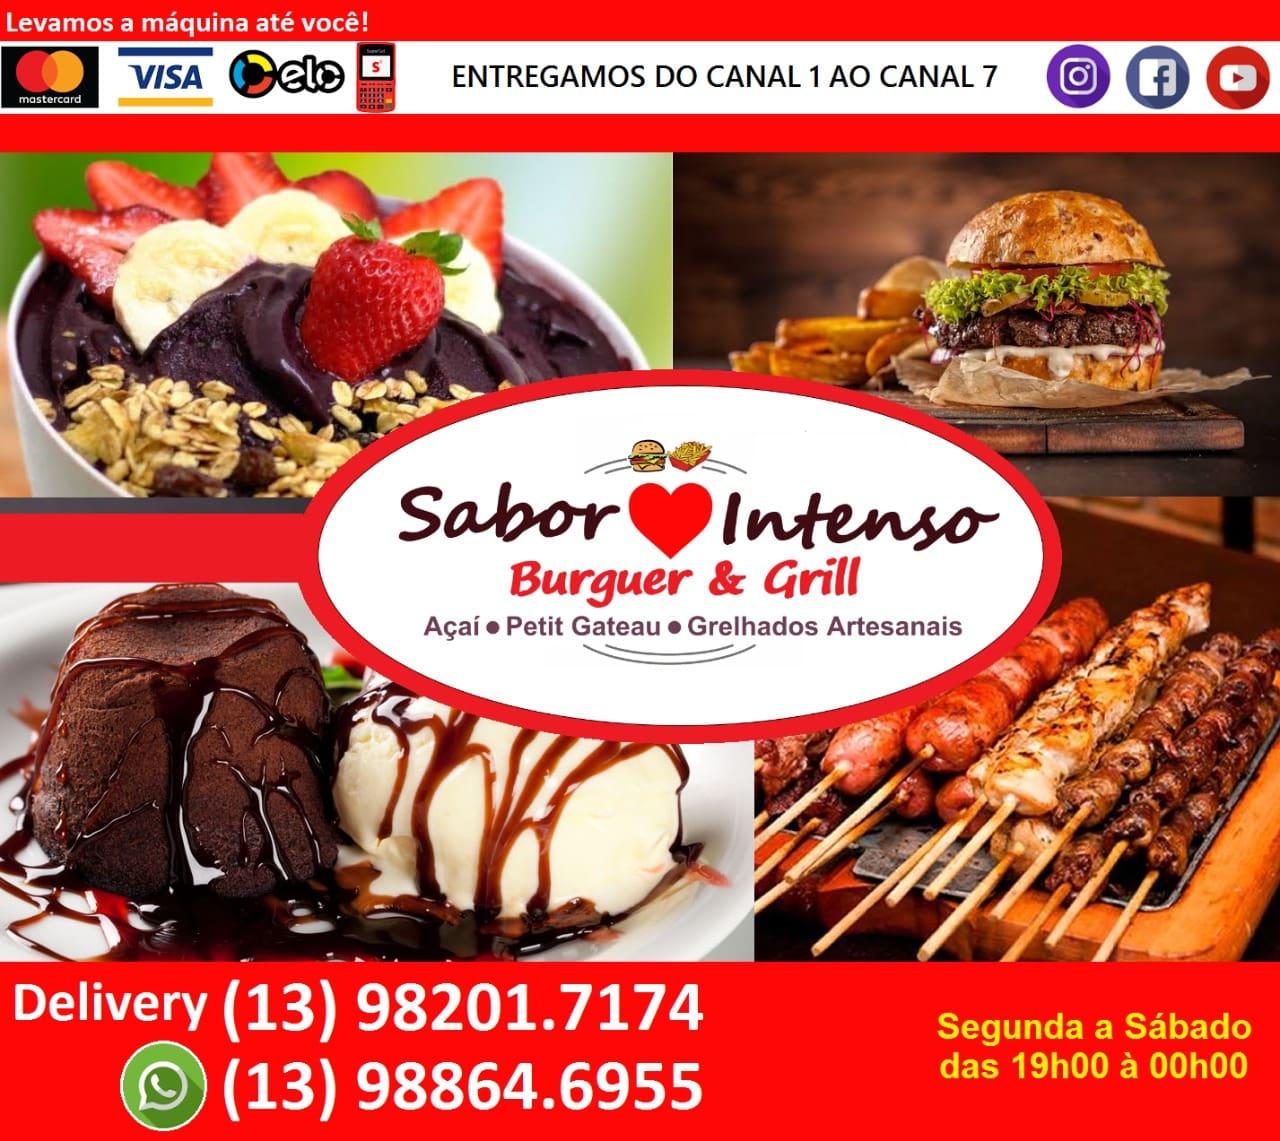 Sabor Intenso Burger P/ R$9,90 Artesanal